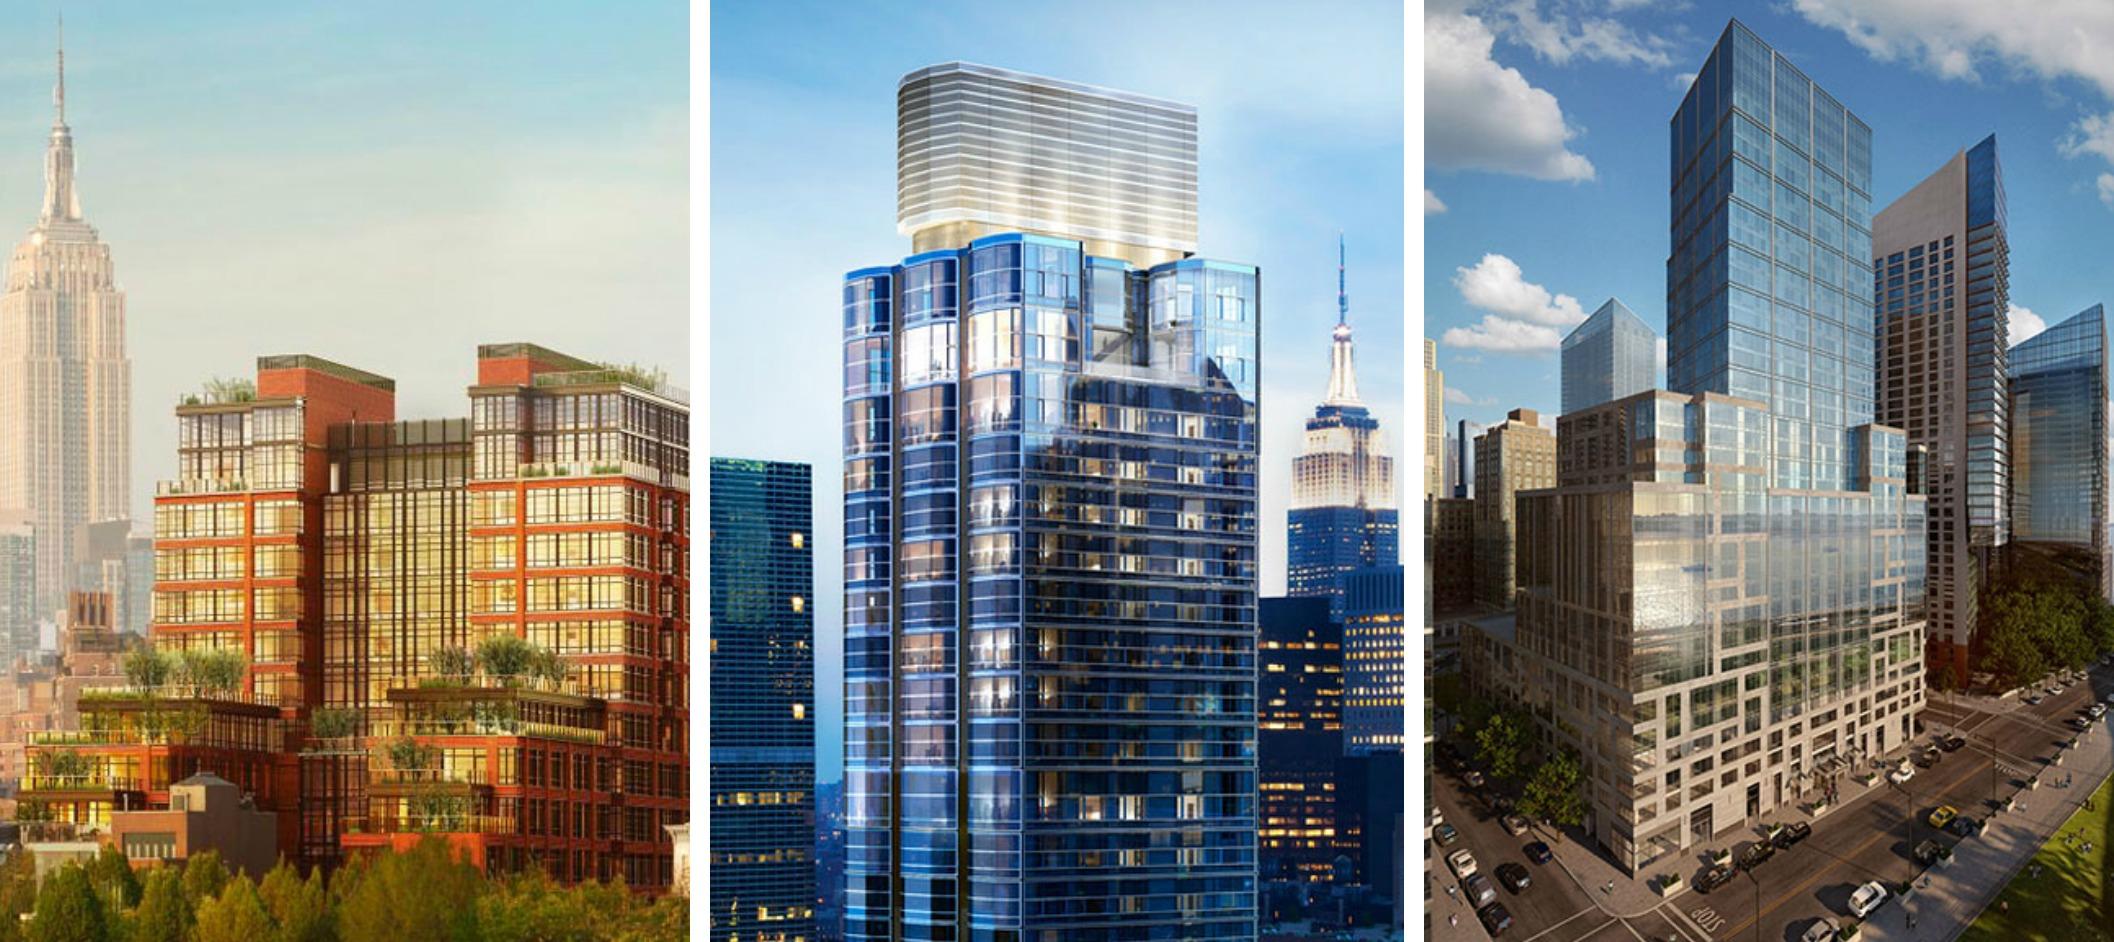 CityRealty 100, 150 Charles Street, 50 United Nations Plaza, One Riverside Park, Manhattan condos